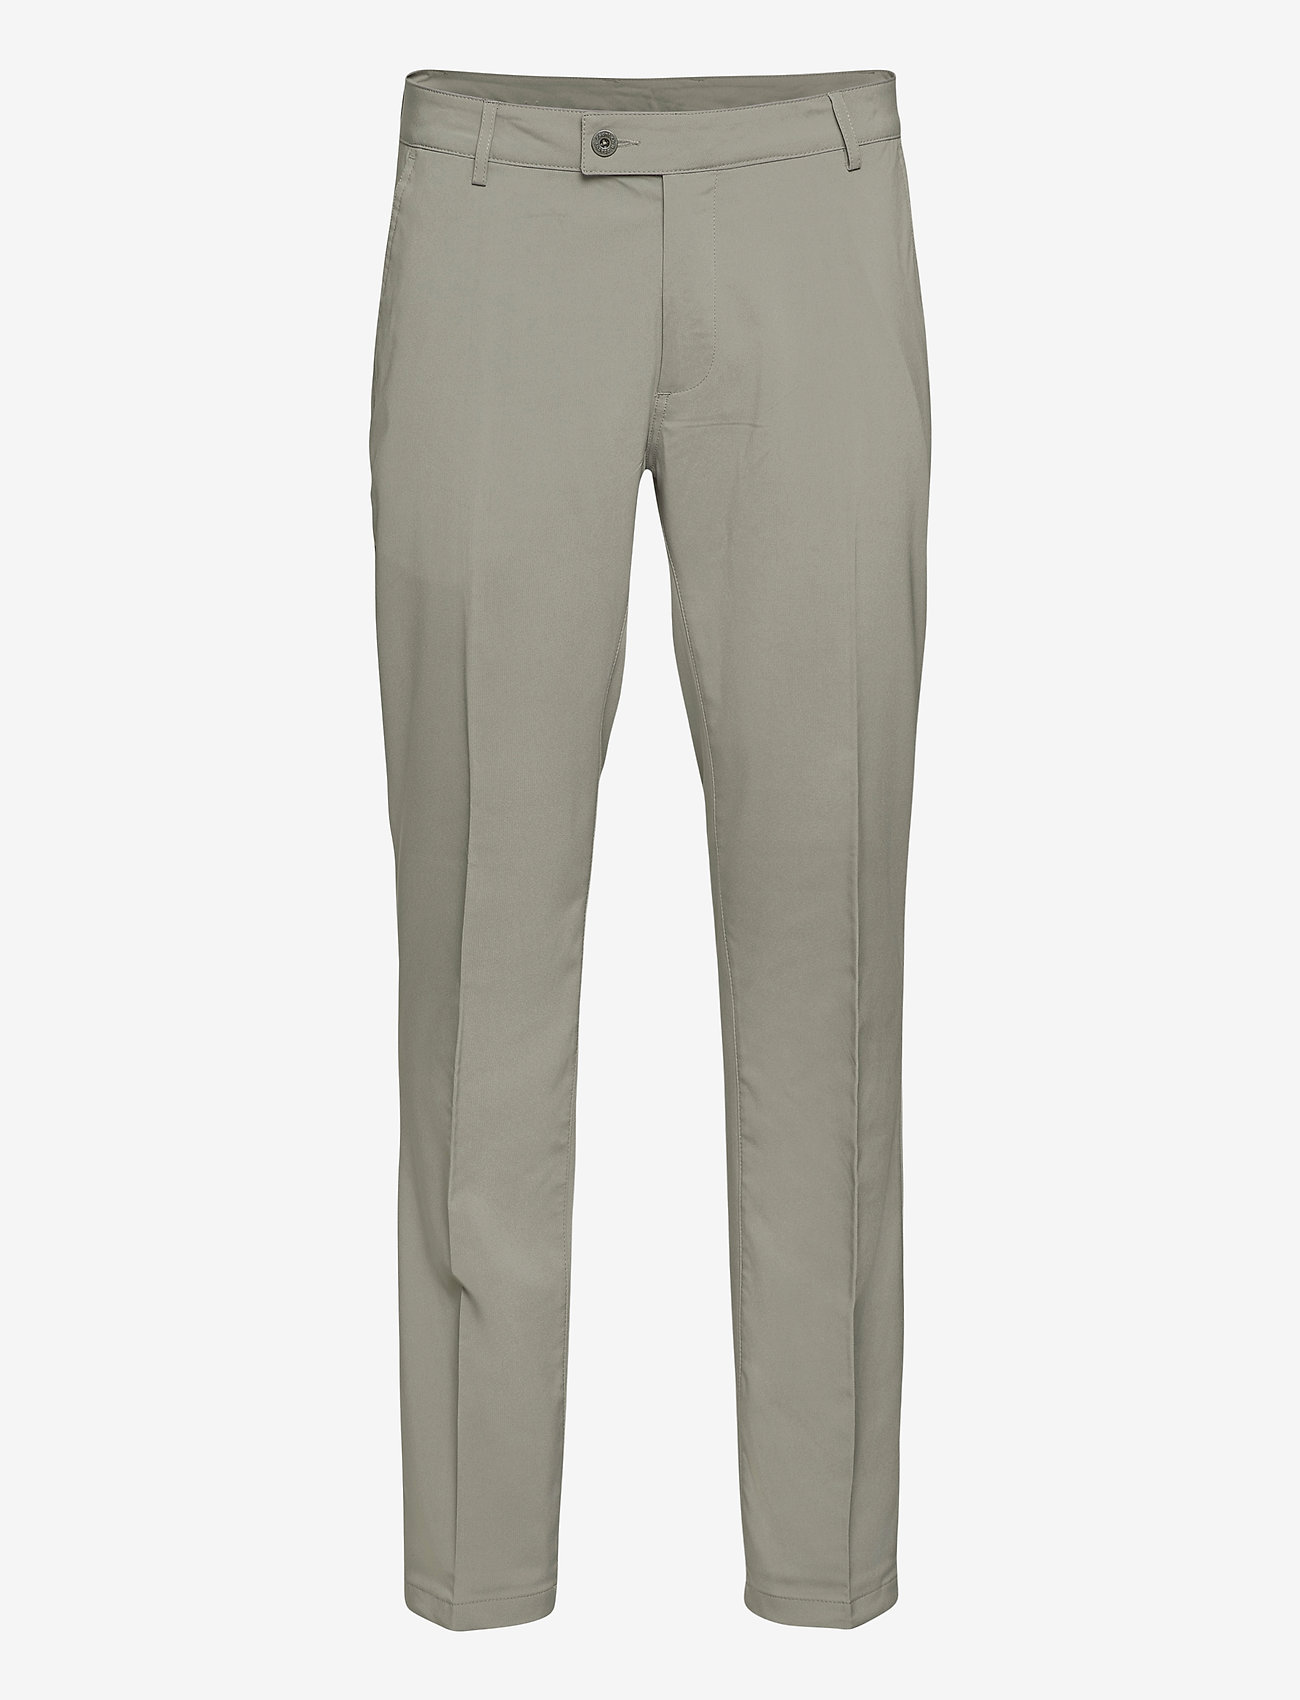 Abacus - Mens Cleek stretch trousers - golf-housut - grey - 0